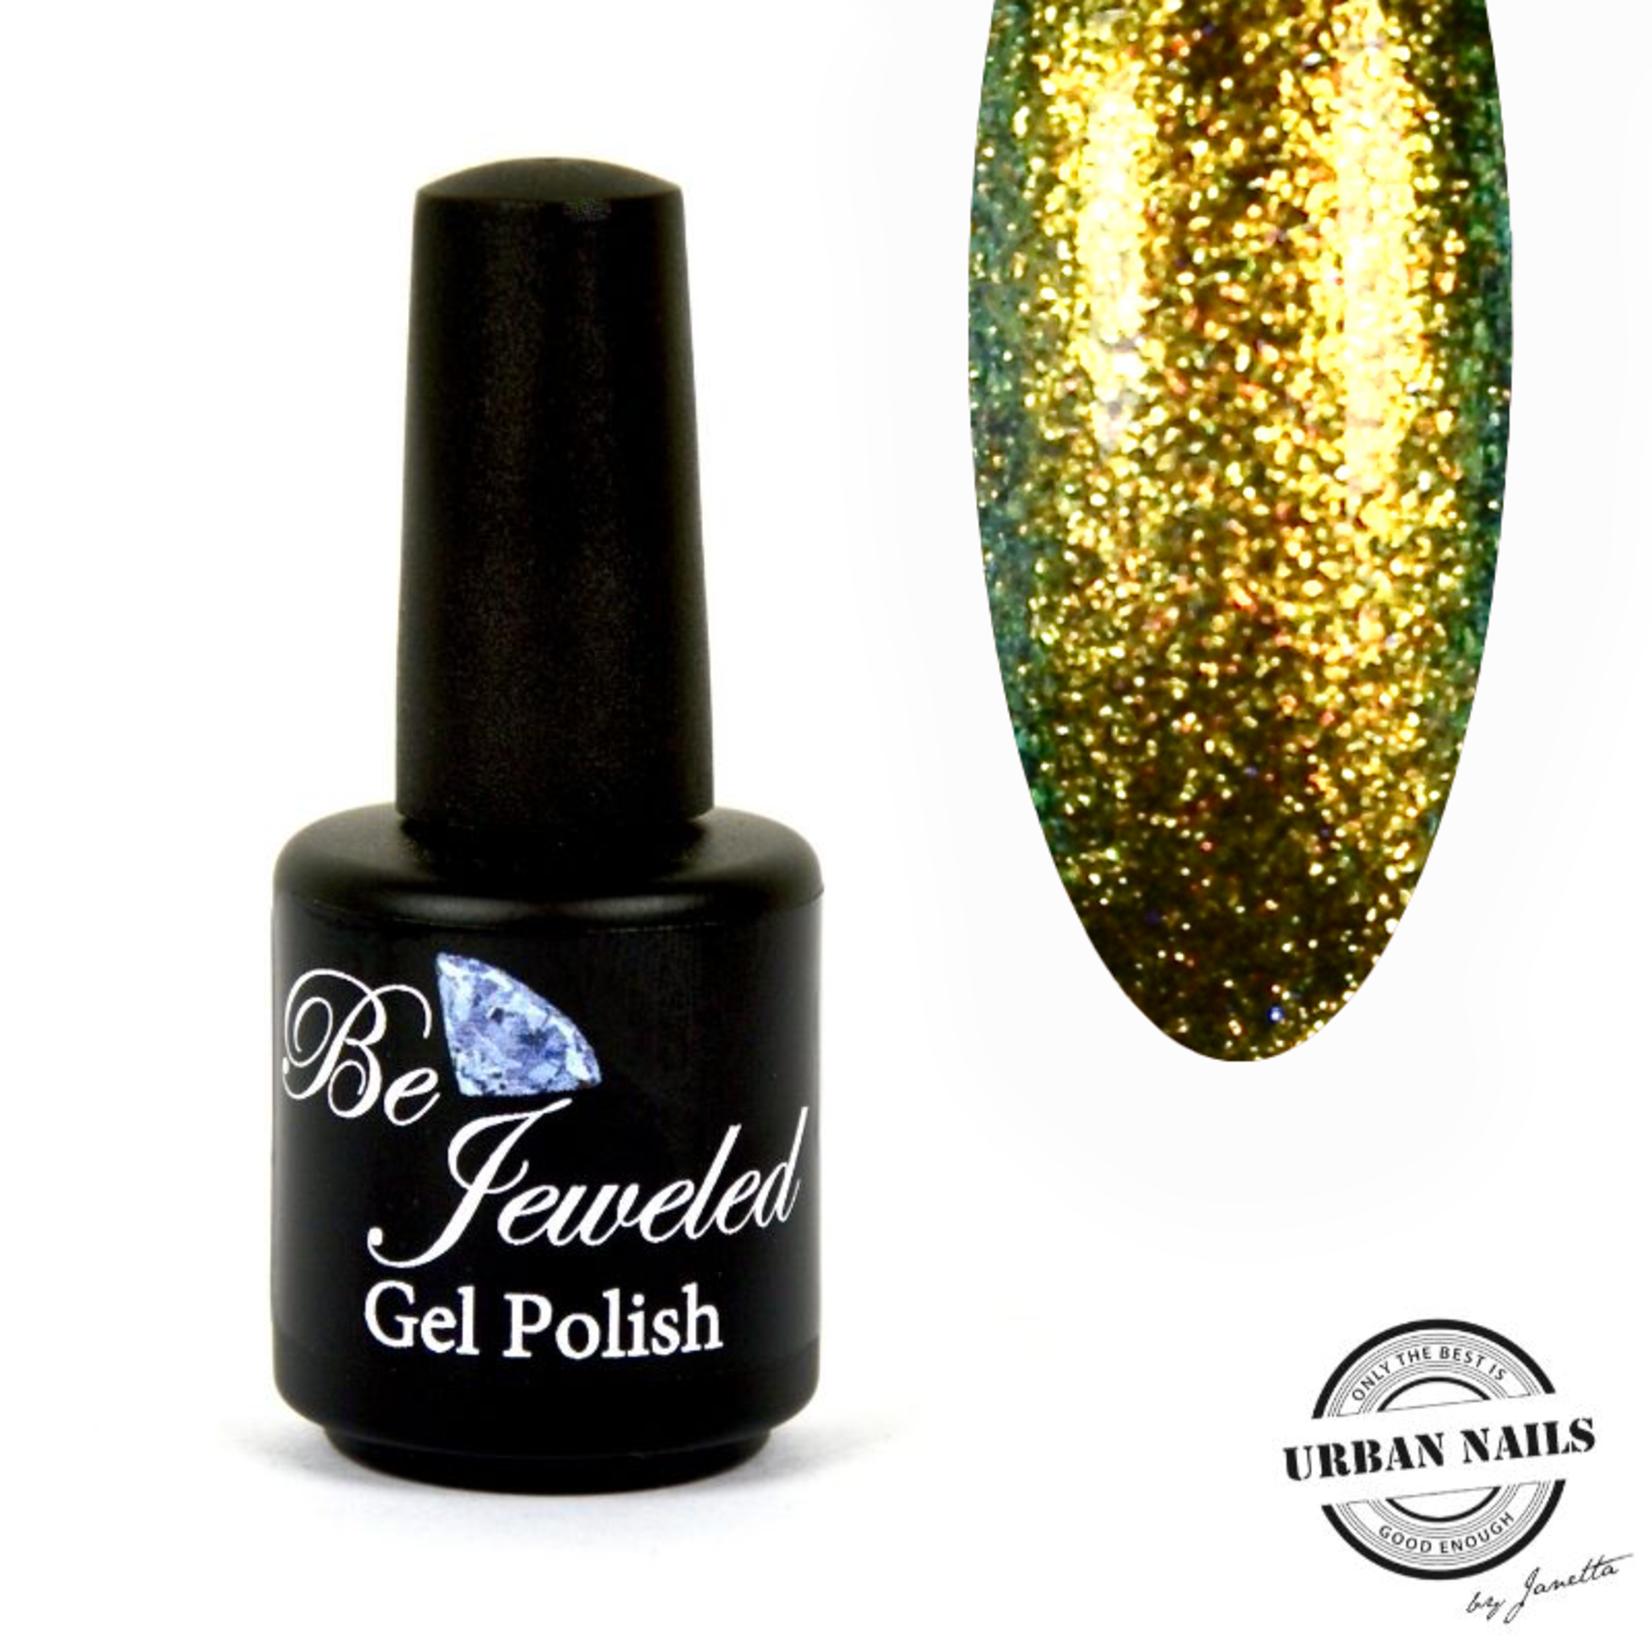 Urban Nails Be Jeweled Enchanted Gelpolish 02 Geel/Zilver